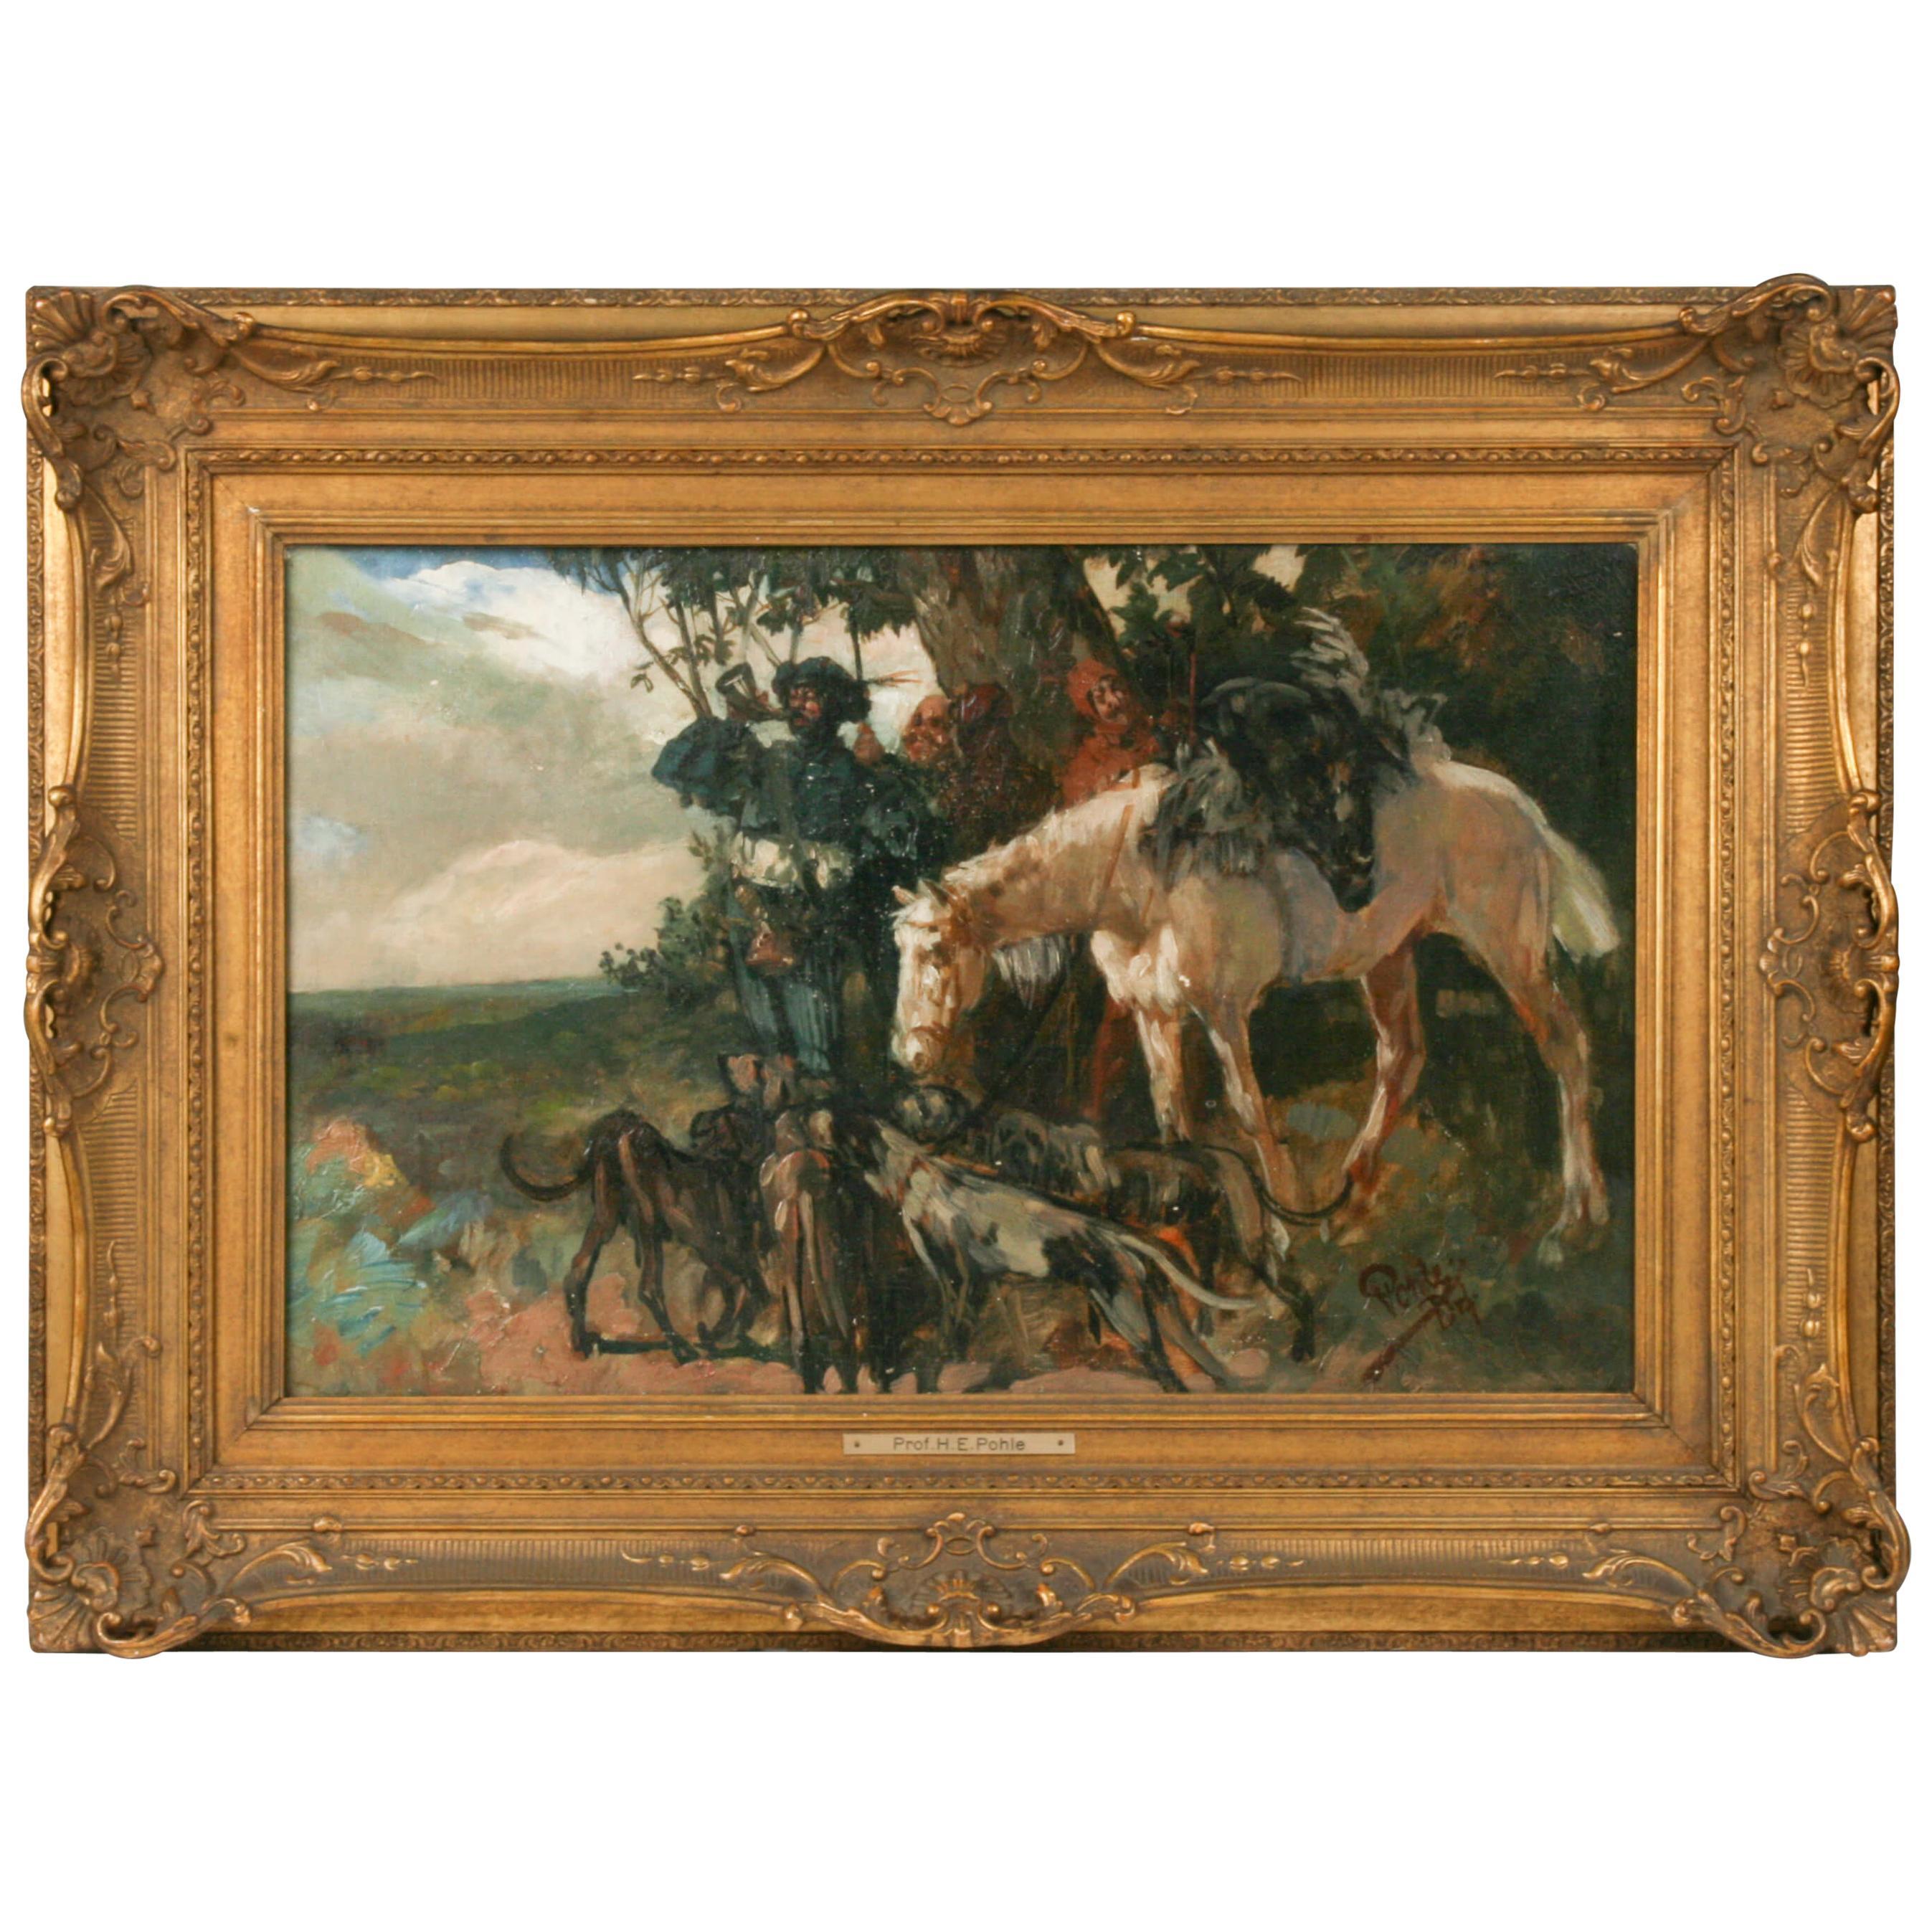 End 19th Century Oil Painting Hunting Scene Herman Emil Pohle